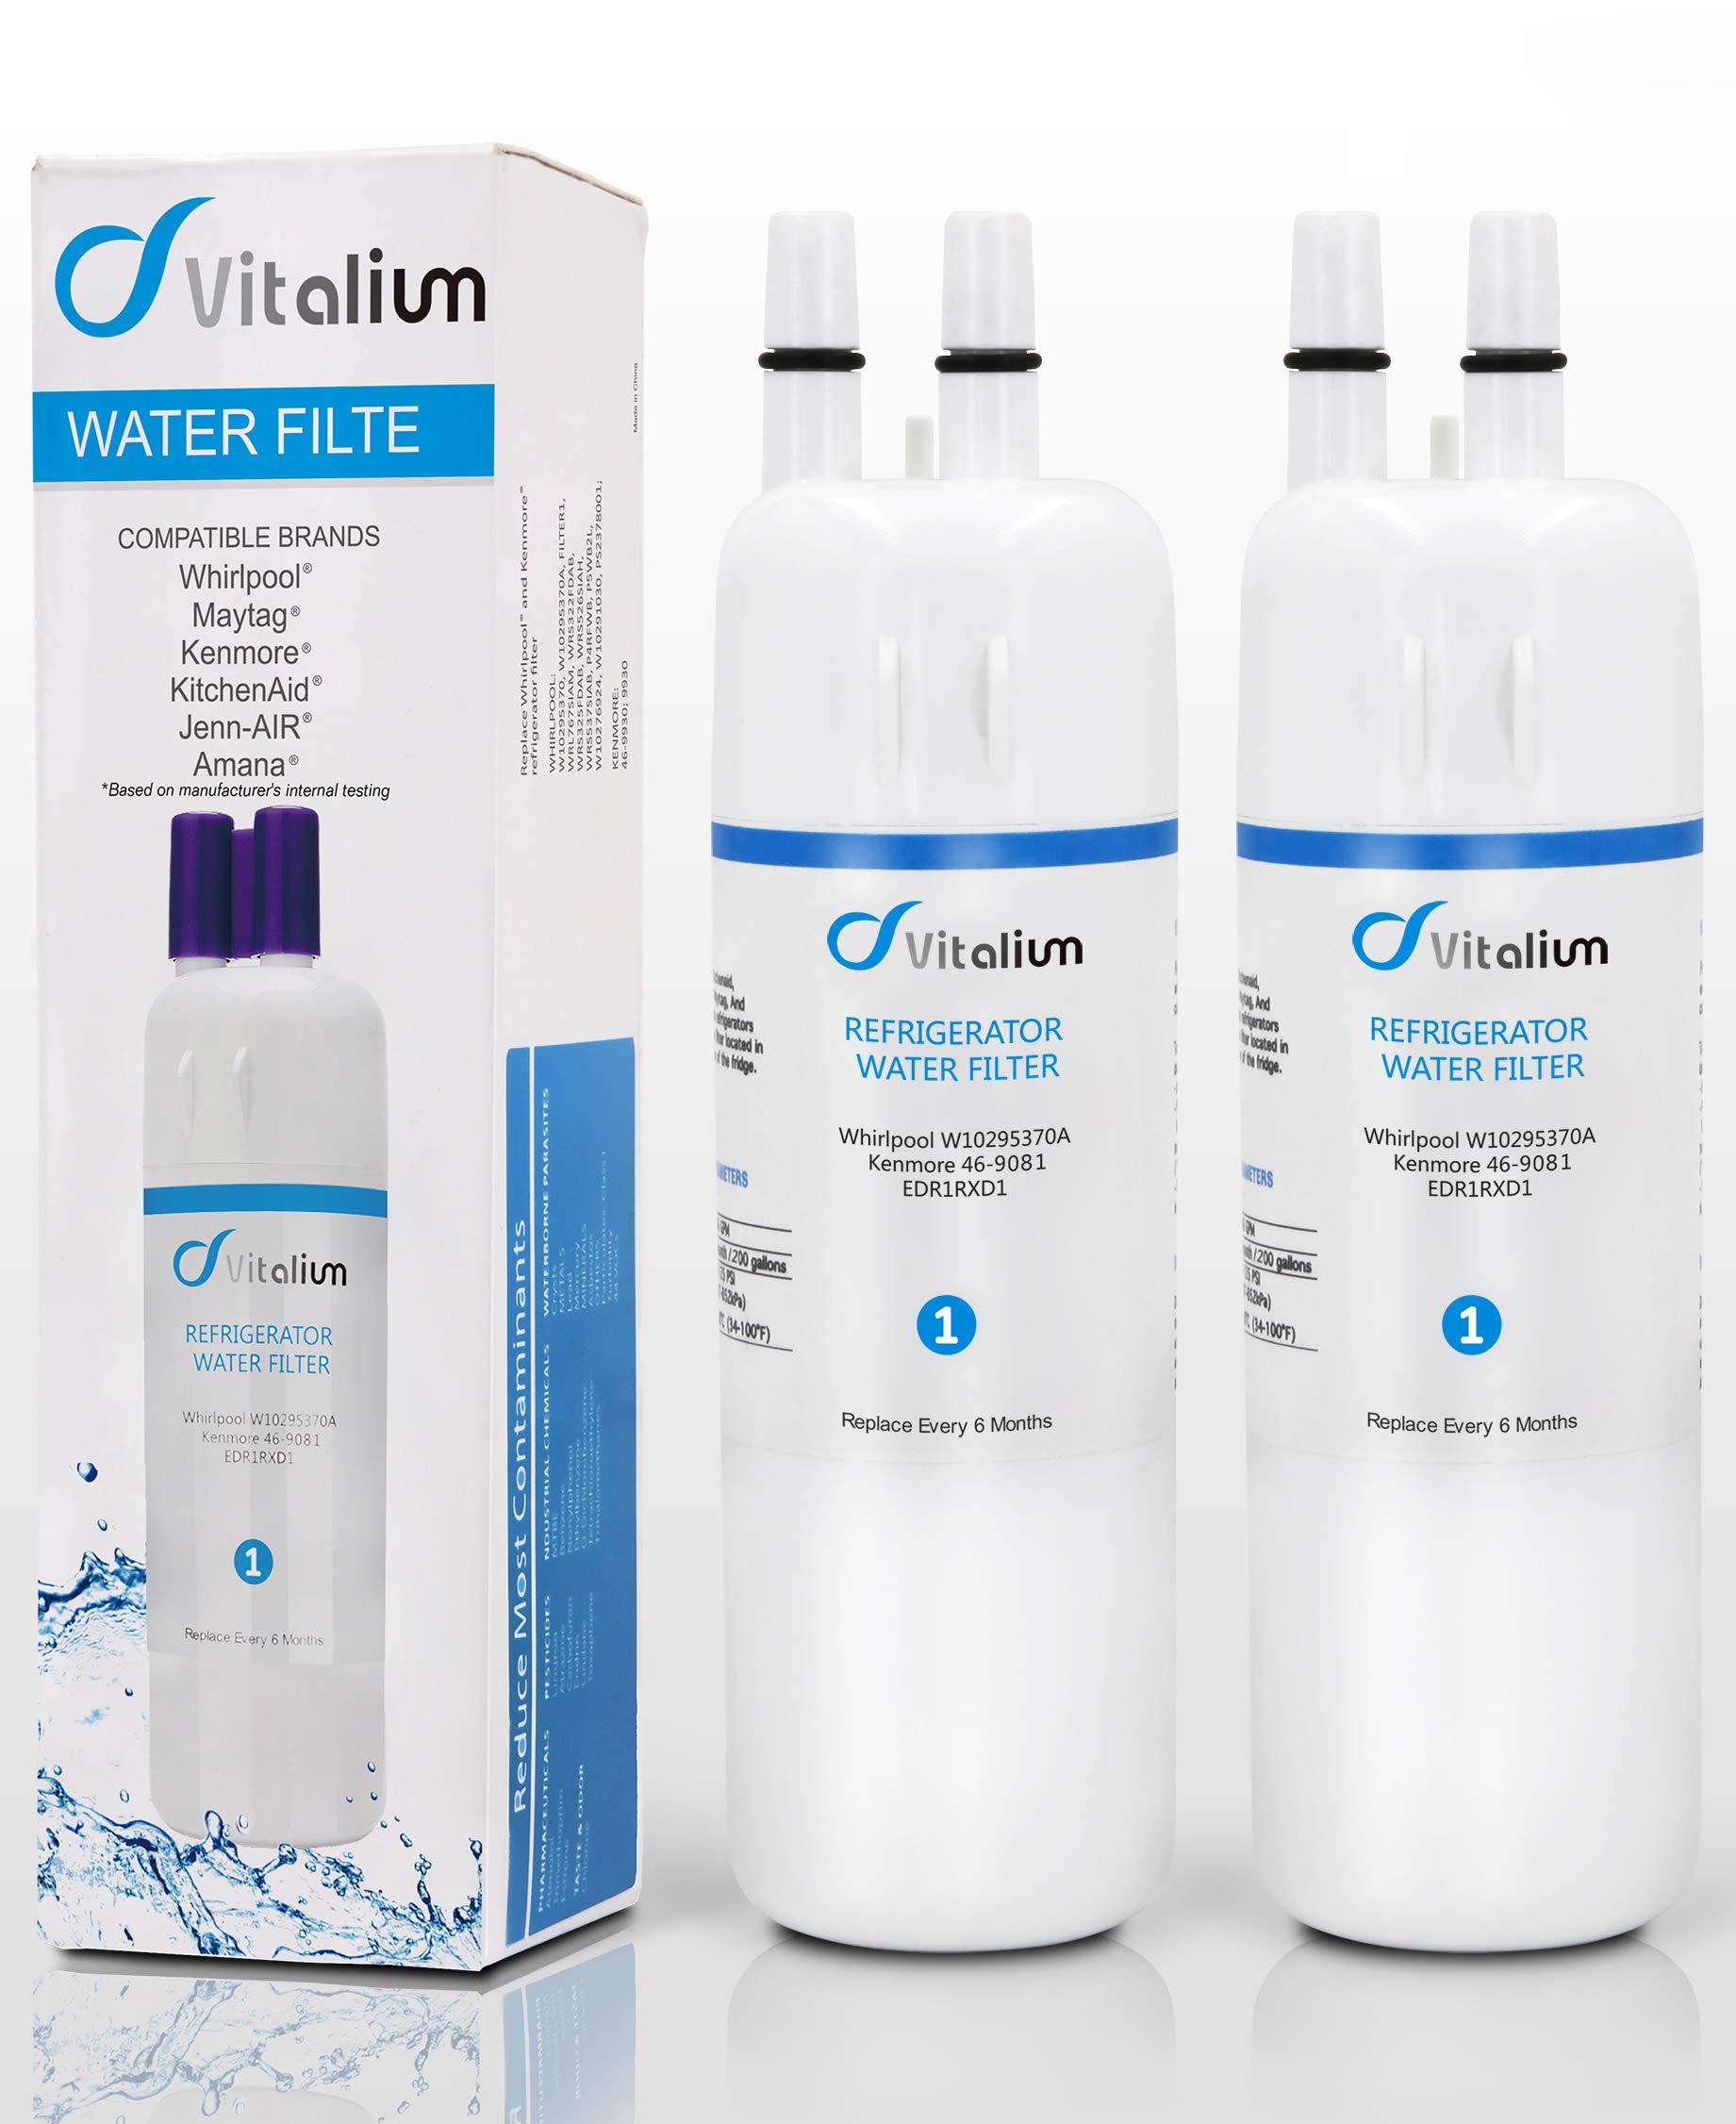 Vitaliums W10295370A W10295370 Refrigerator Water Filter 1 EDR1RXD1 P4RFWB Kenmore 46-9930 Kenmore 46-9081